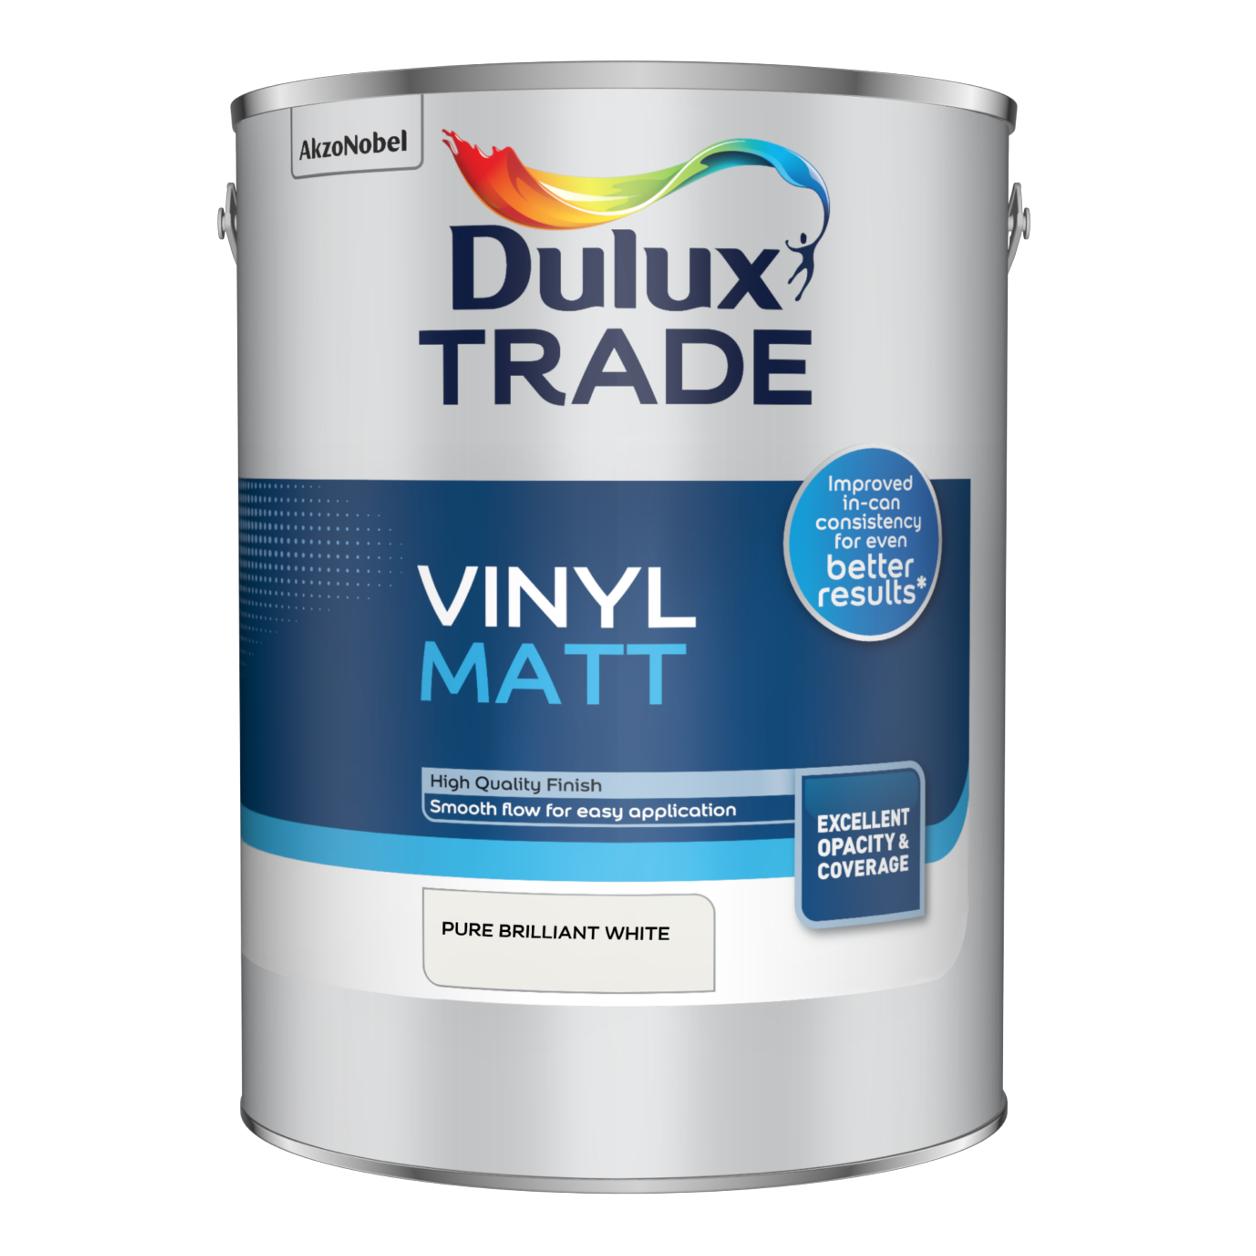 Dulux Trade Vinyl Matt - Pure Brilliant White / Magnolia 7.5L £26.39 at Dulux Shop